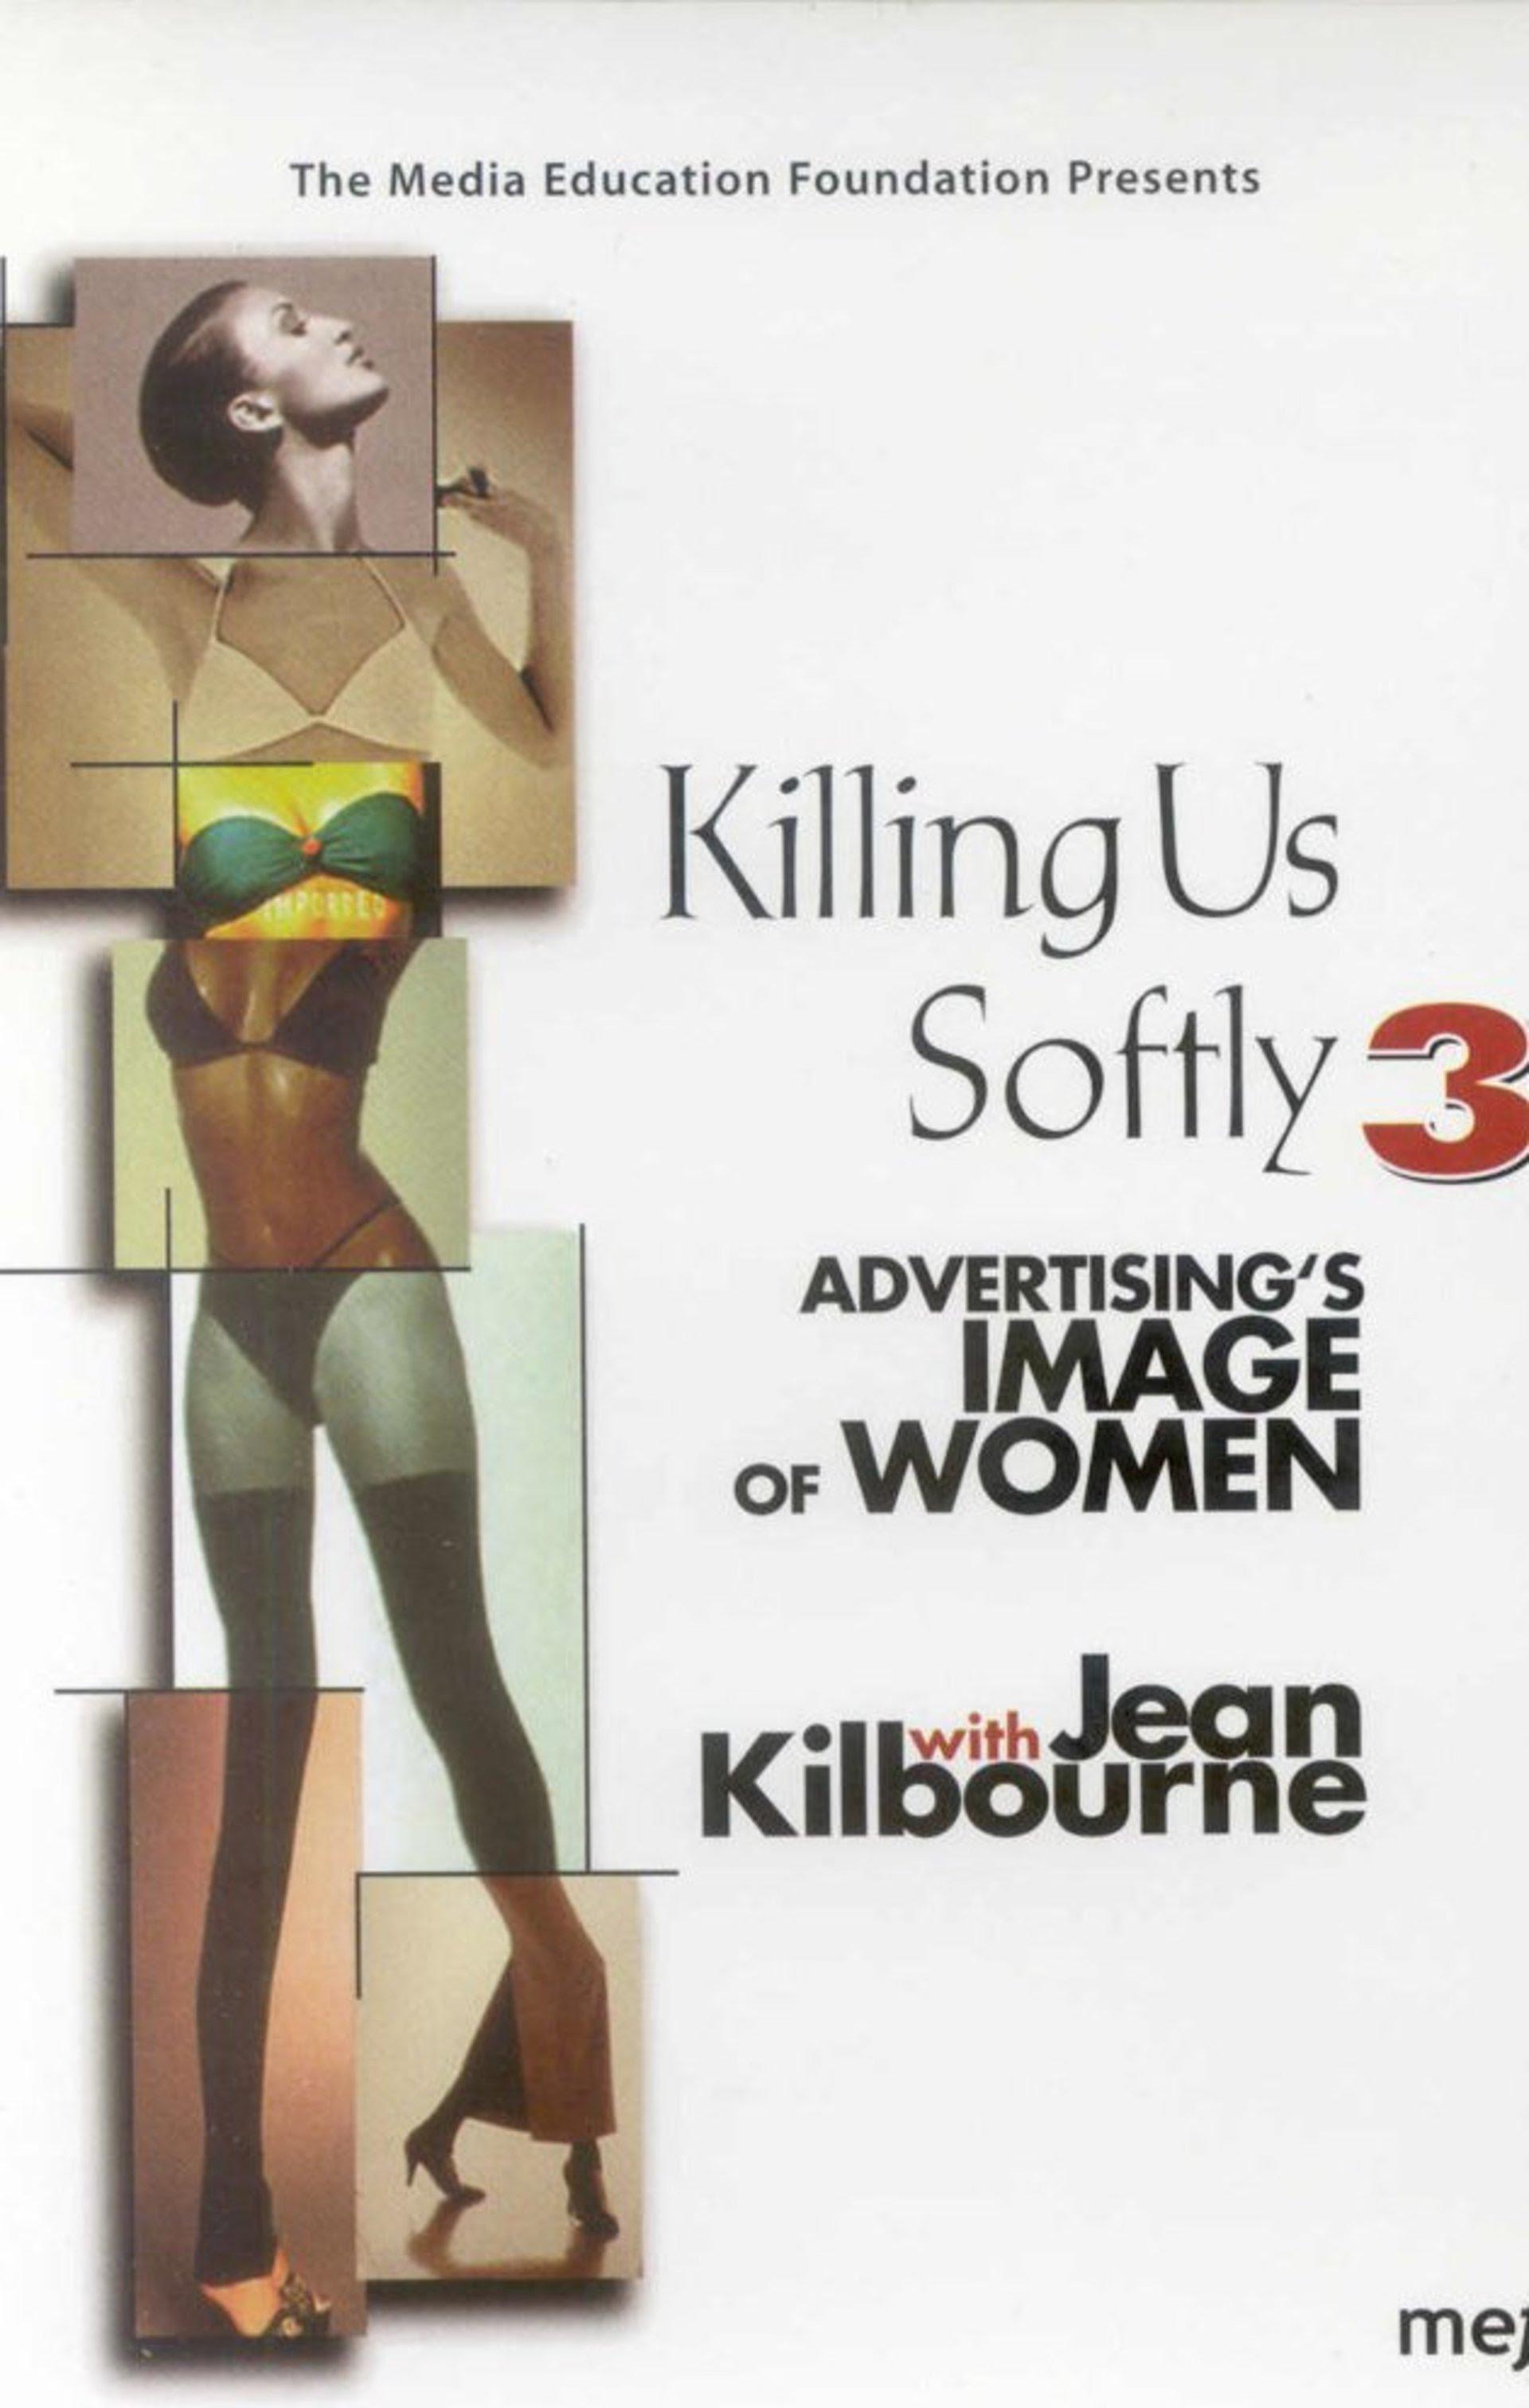 Killing Us Softly 3